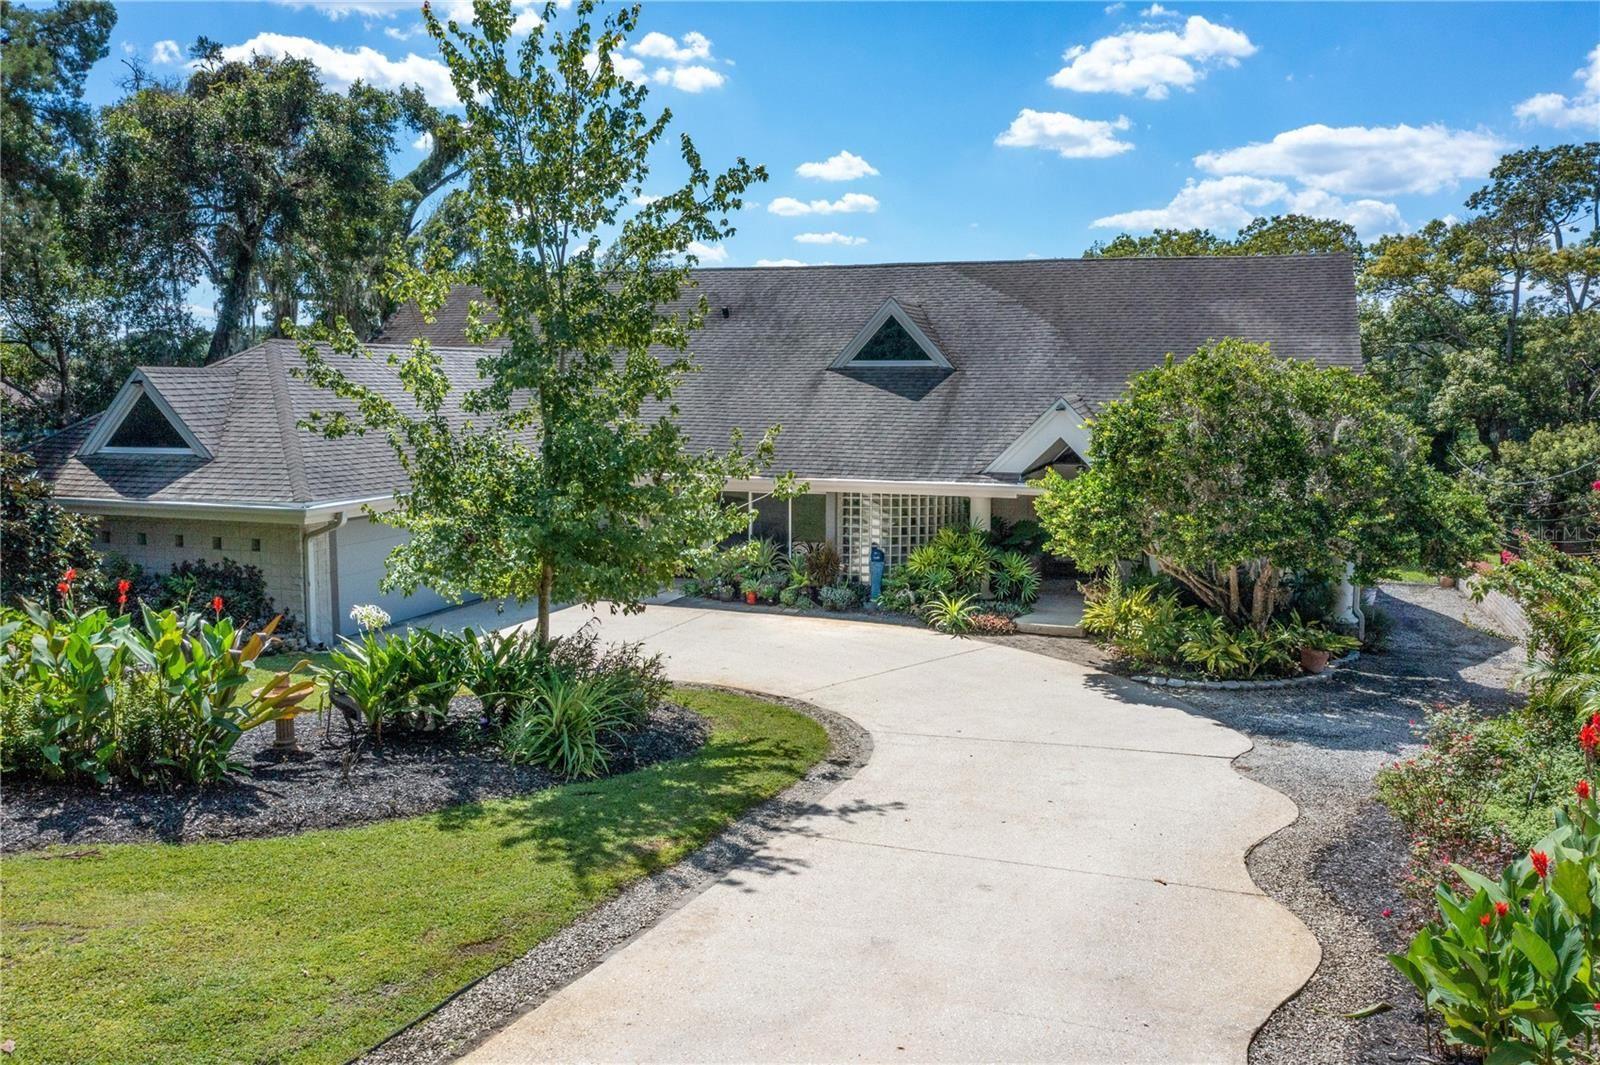 936 LAKE MARION DRIVE, Altamonte Springs, FL 32701 - #: O5975922